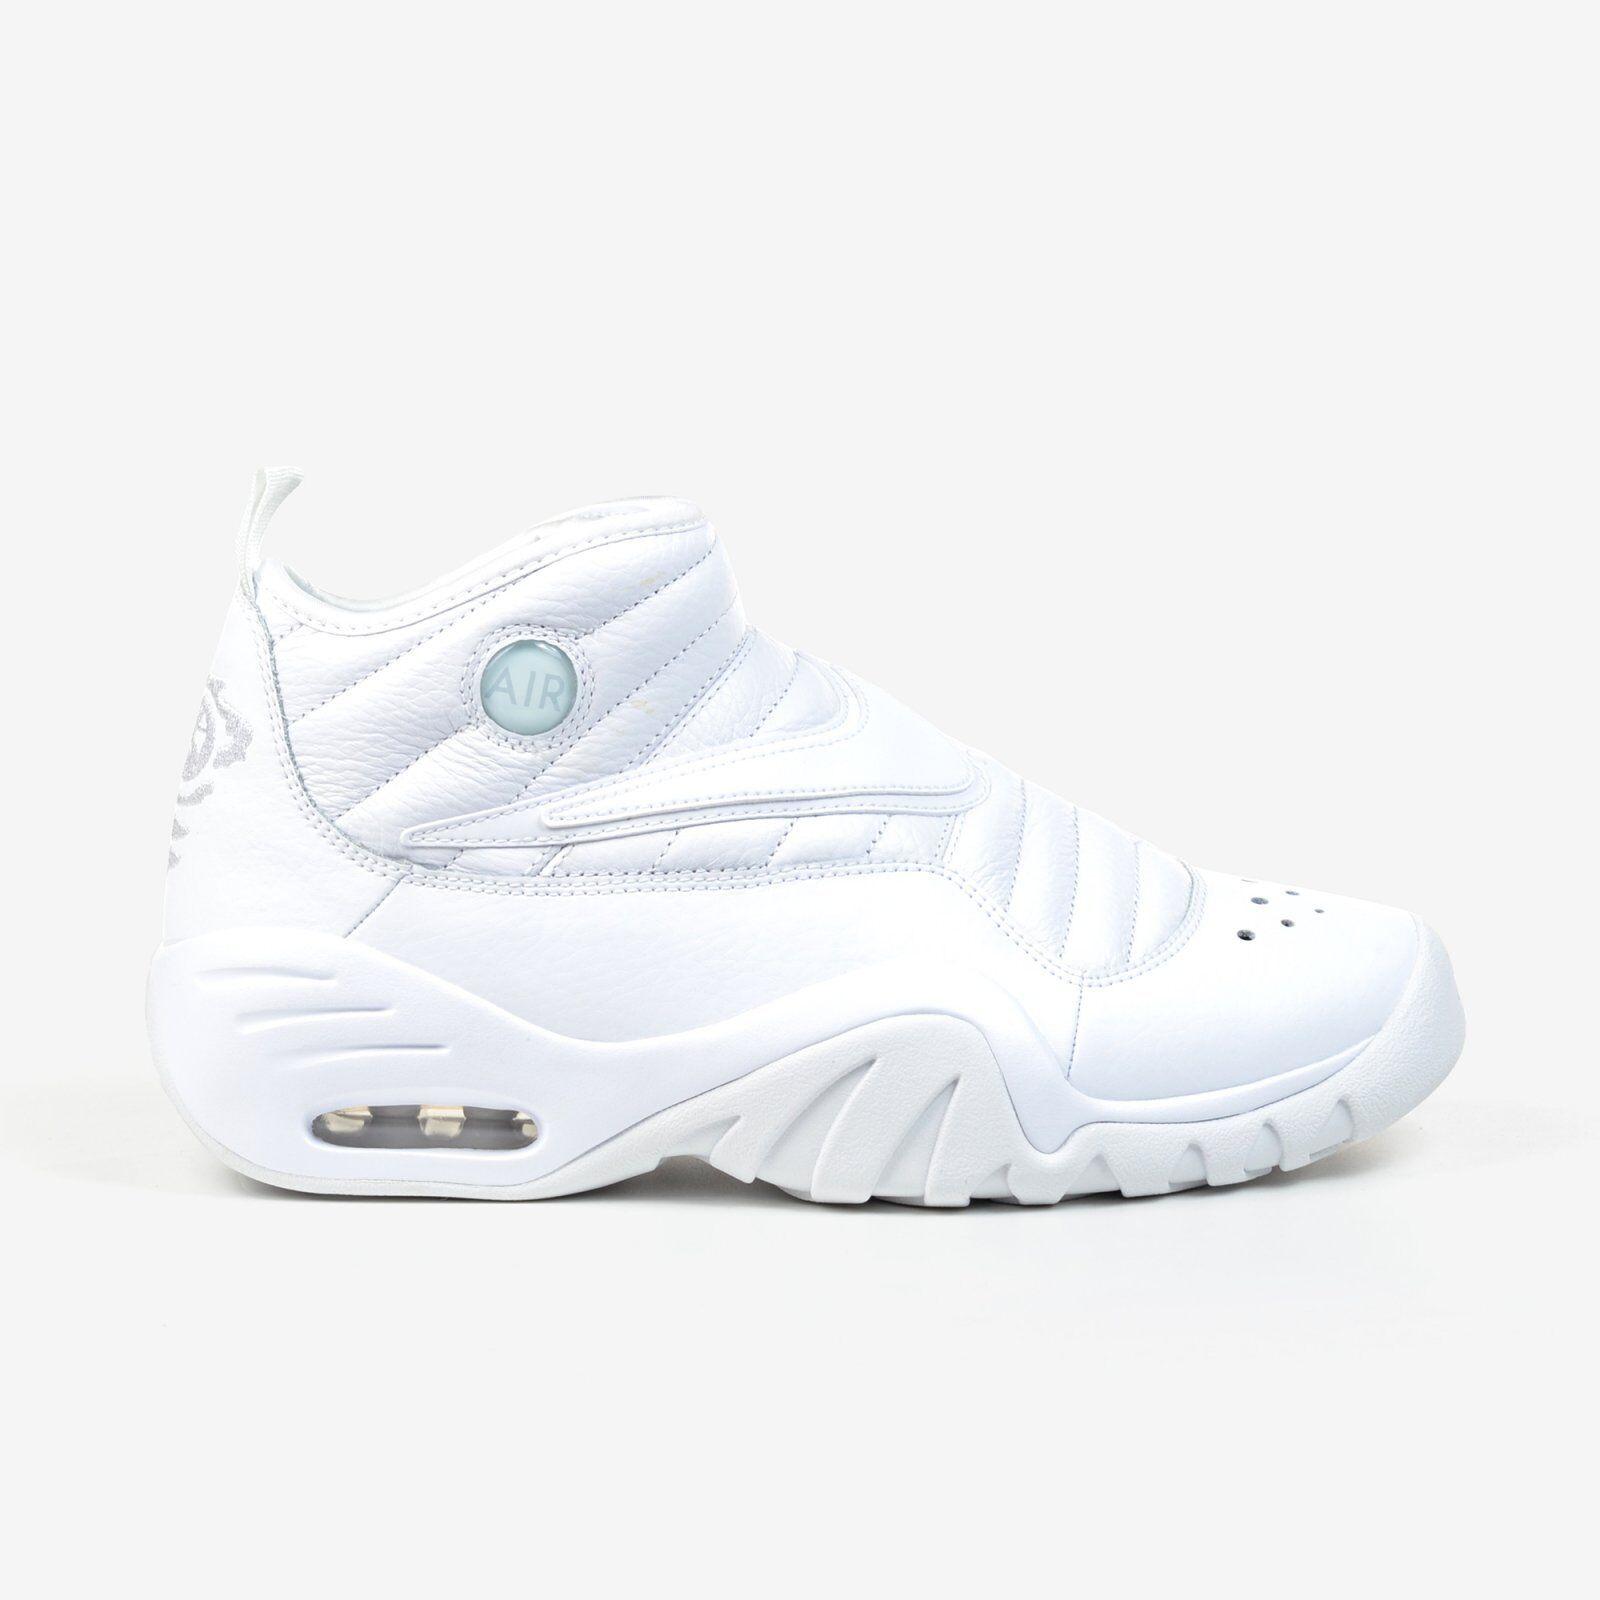 Nike Air Shake Shoes Ndstrukt White Triple White Men's Basketball Shoes Shake NIB 886869-101 94da55